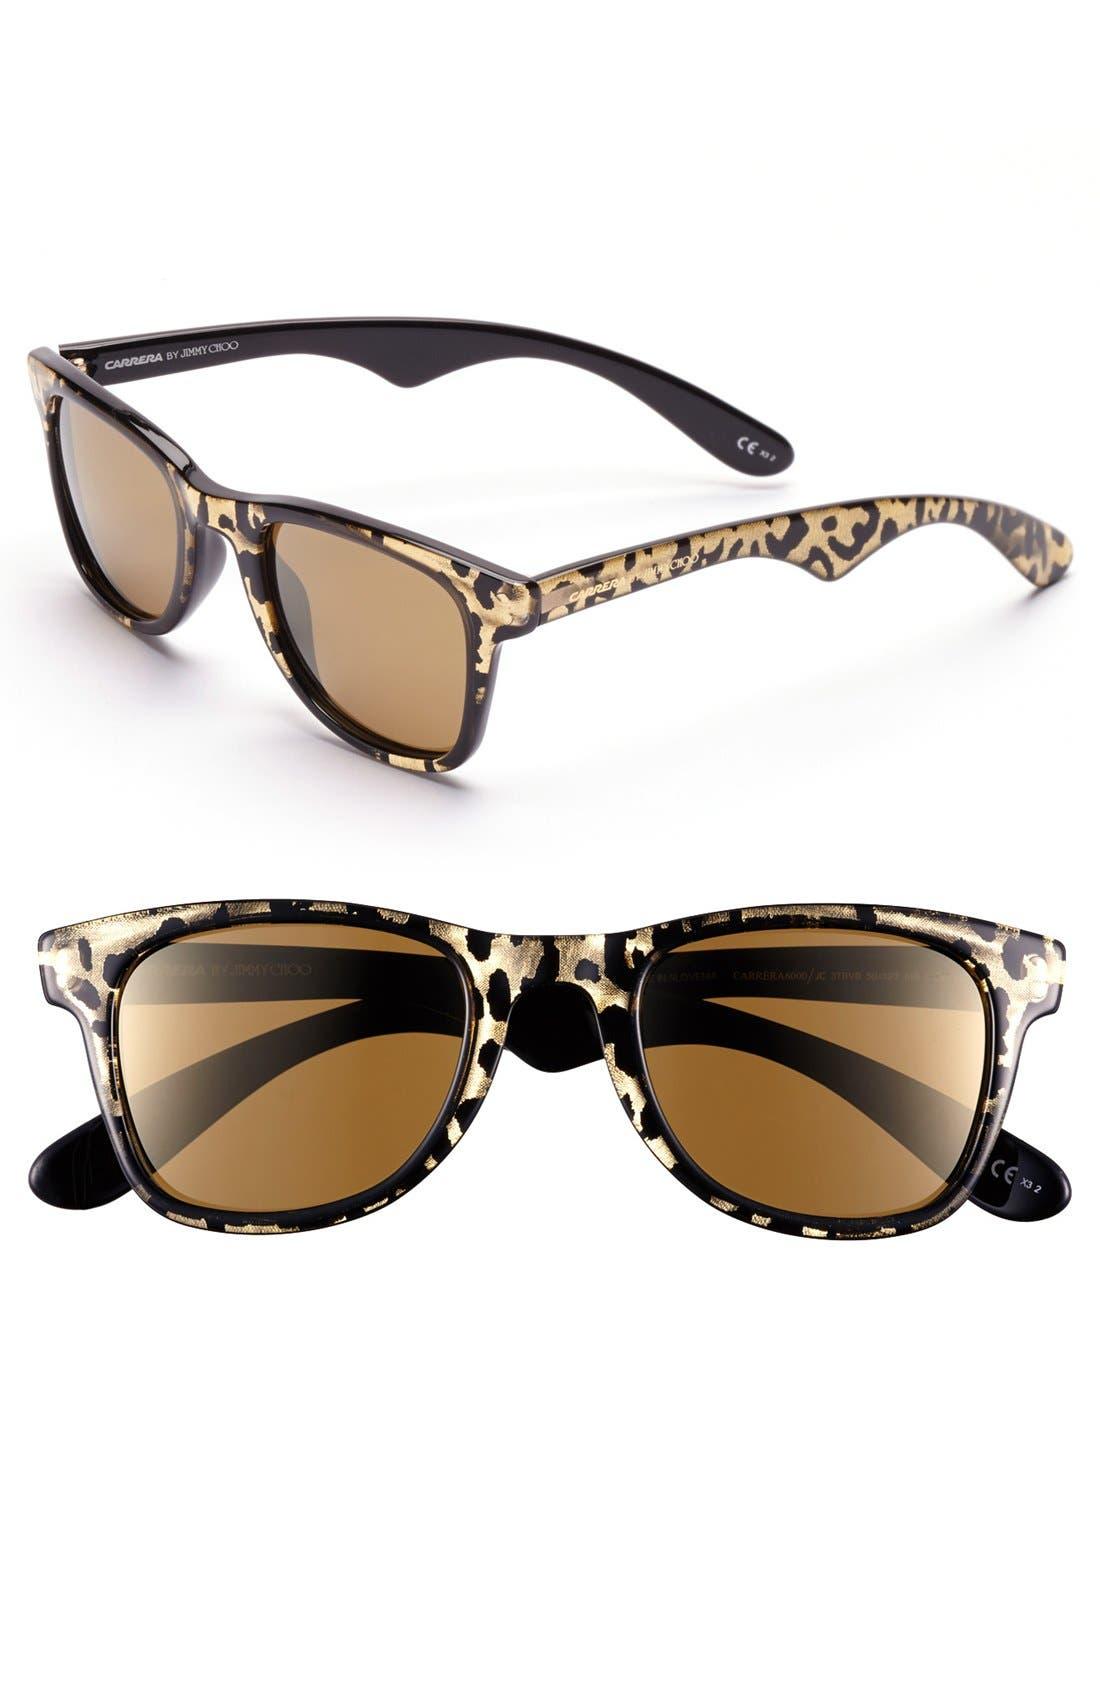 Alternate Image 1 Selected - Carrera by Jimmy Choo 50mm Sunglasses